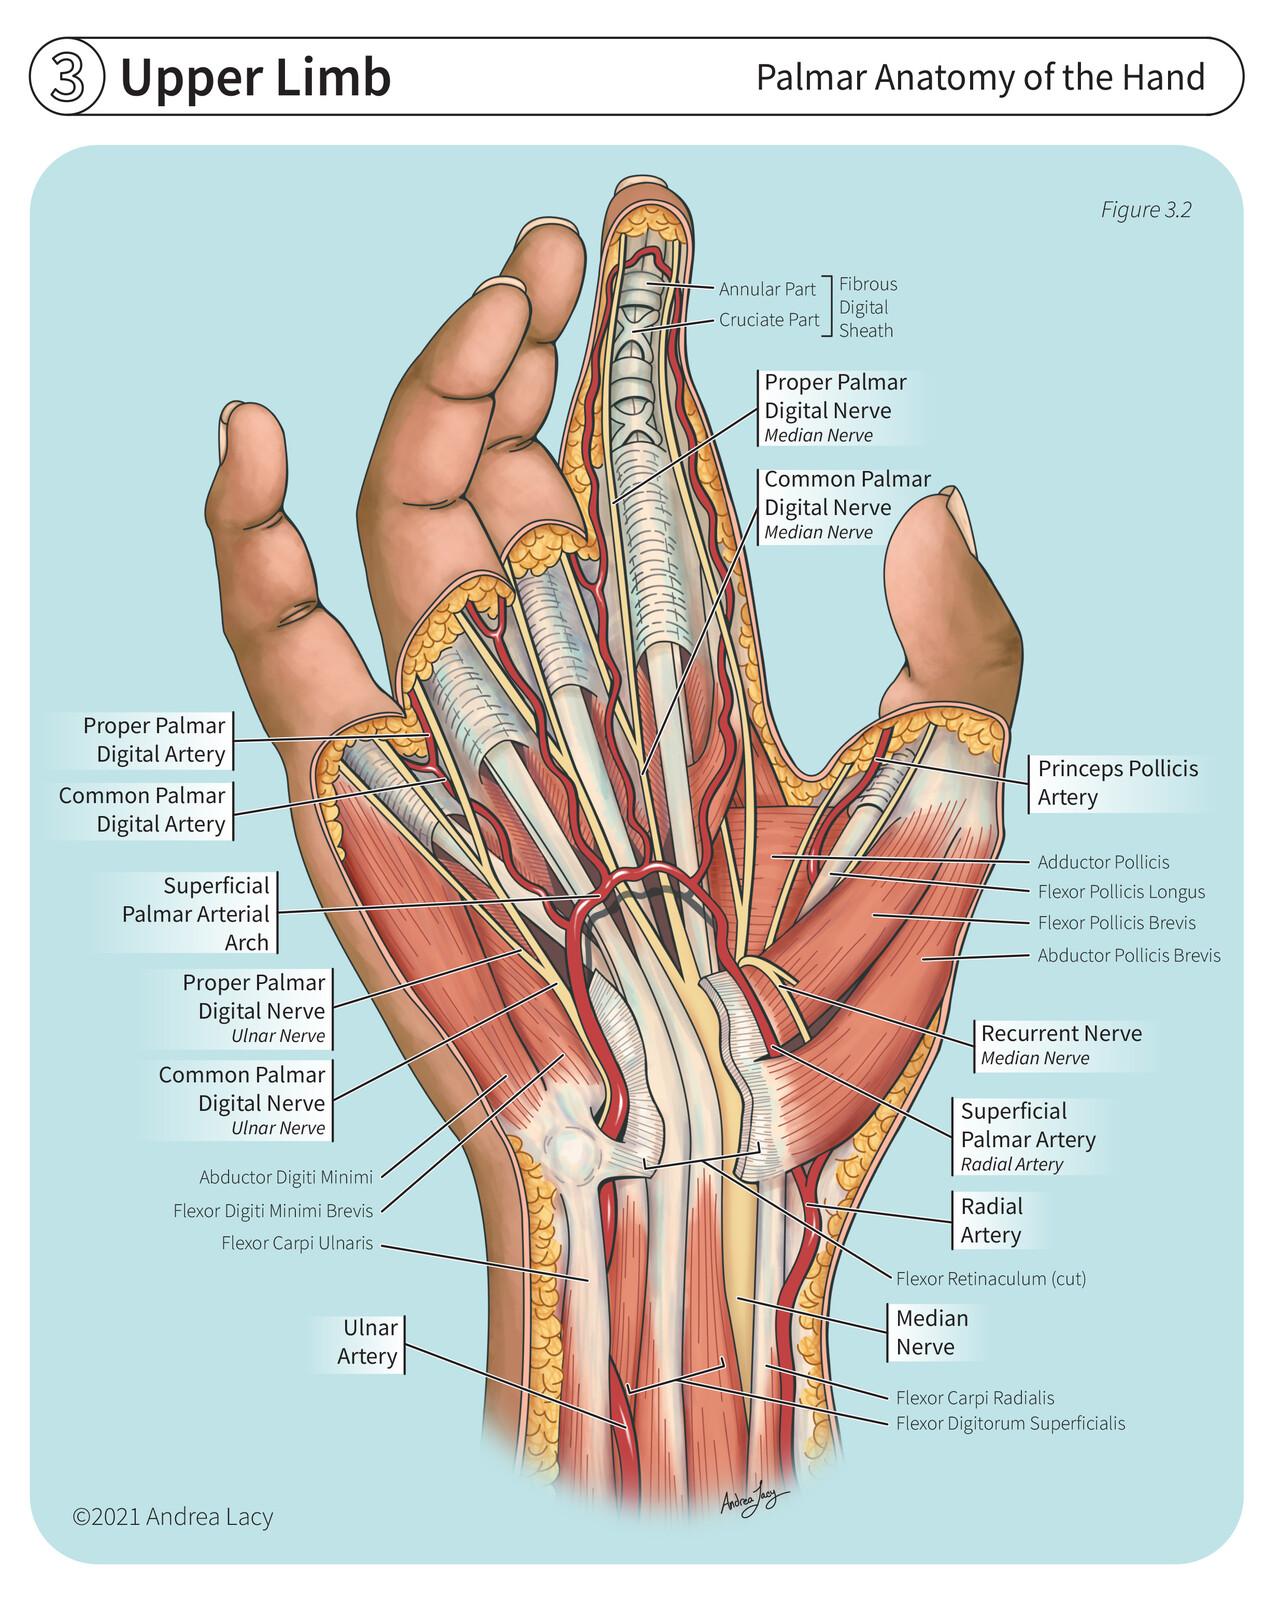 Palmar Anatomy of the Hand